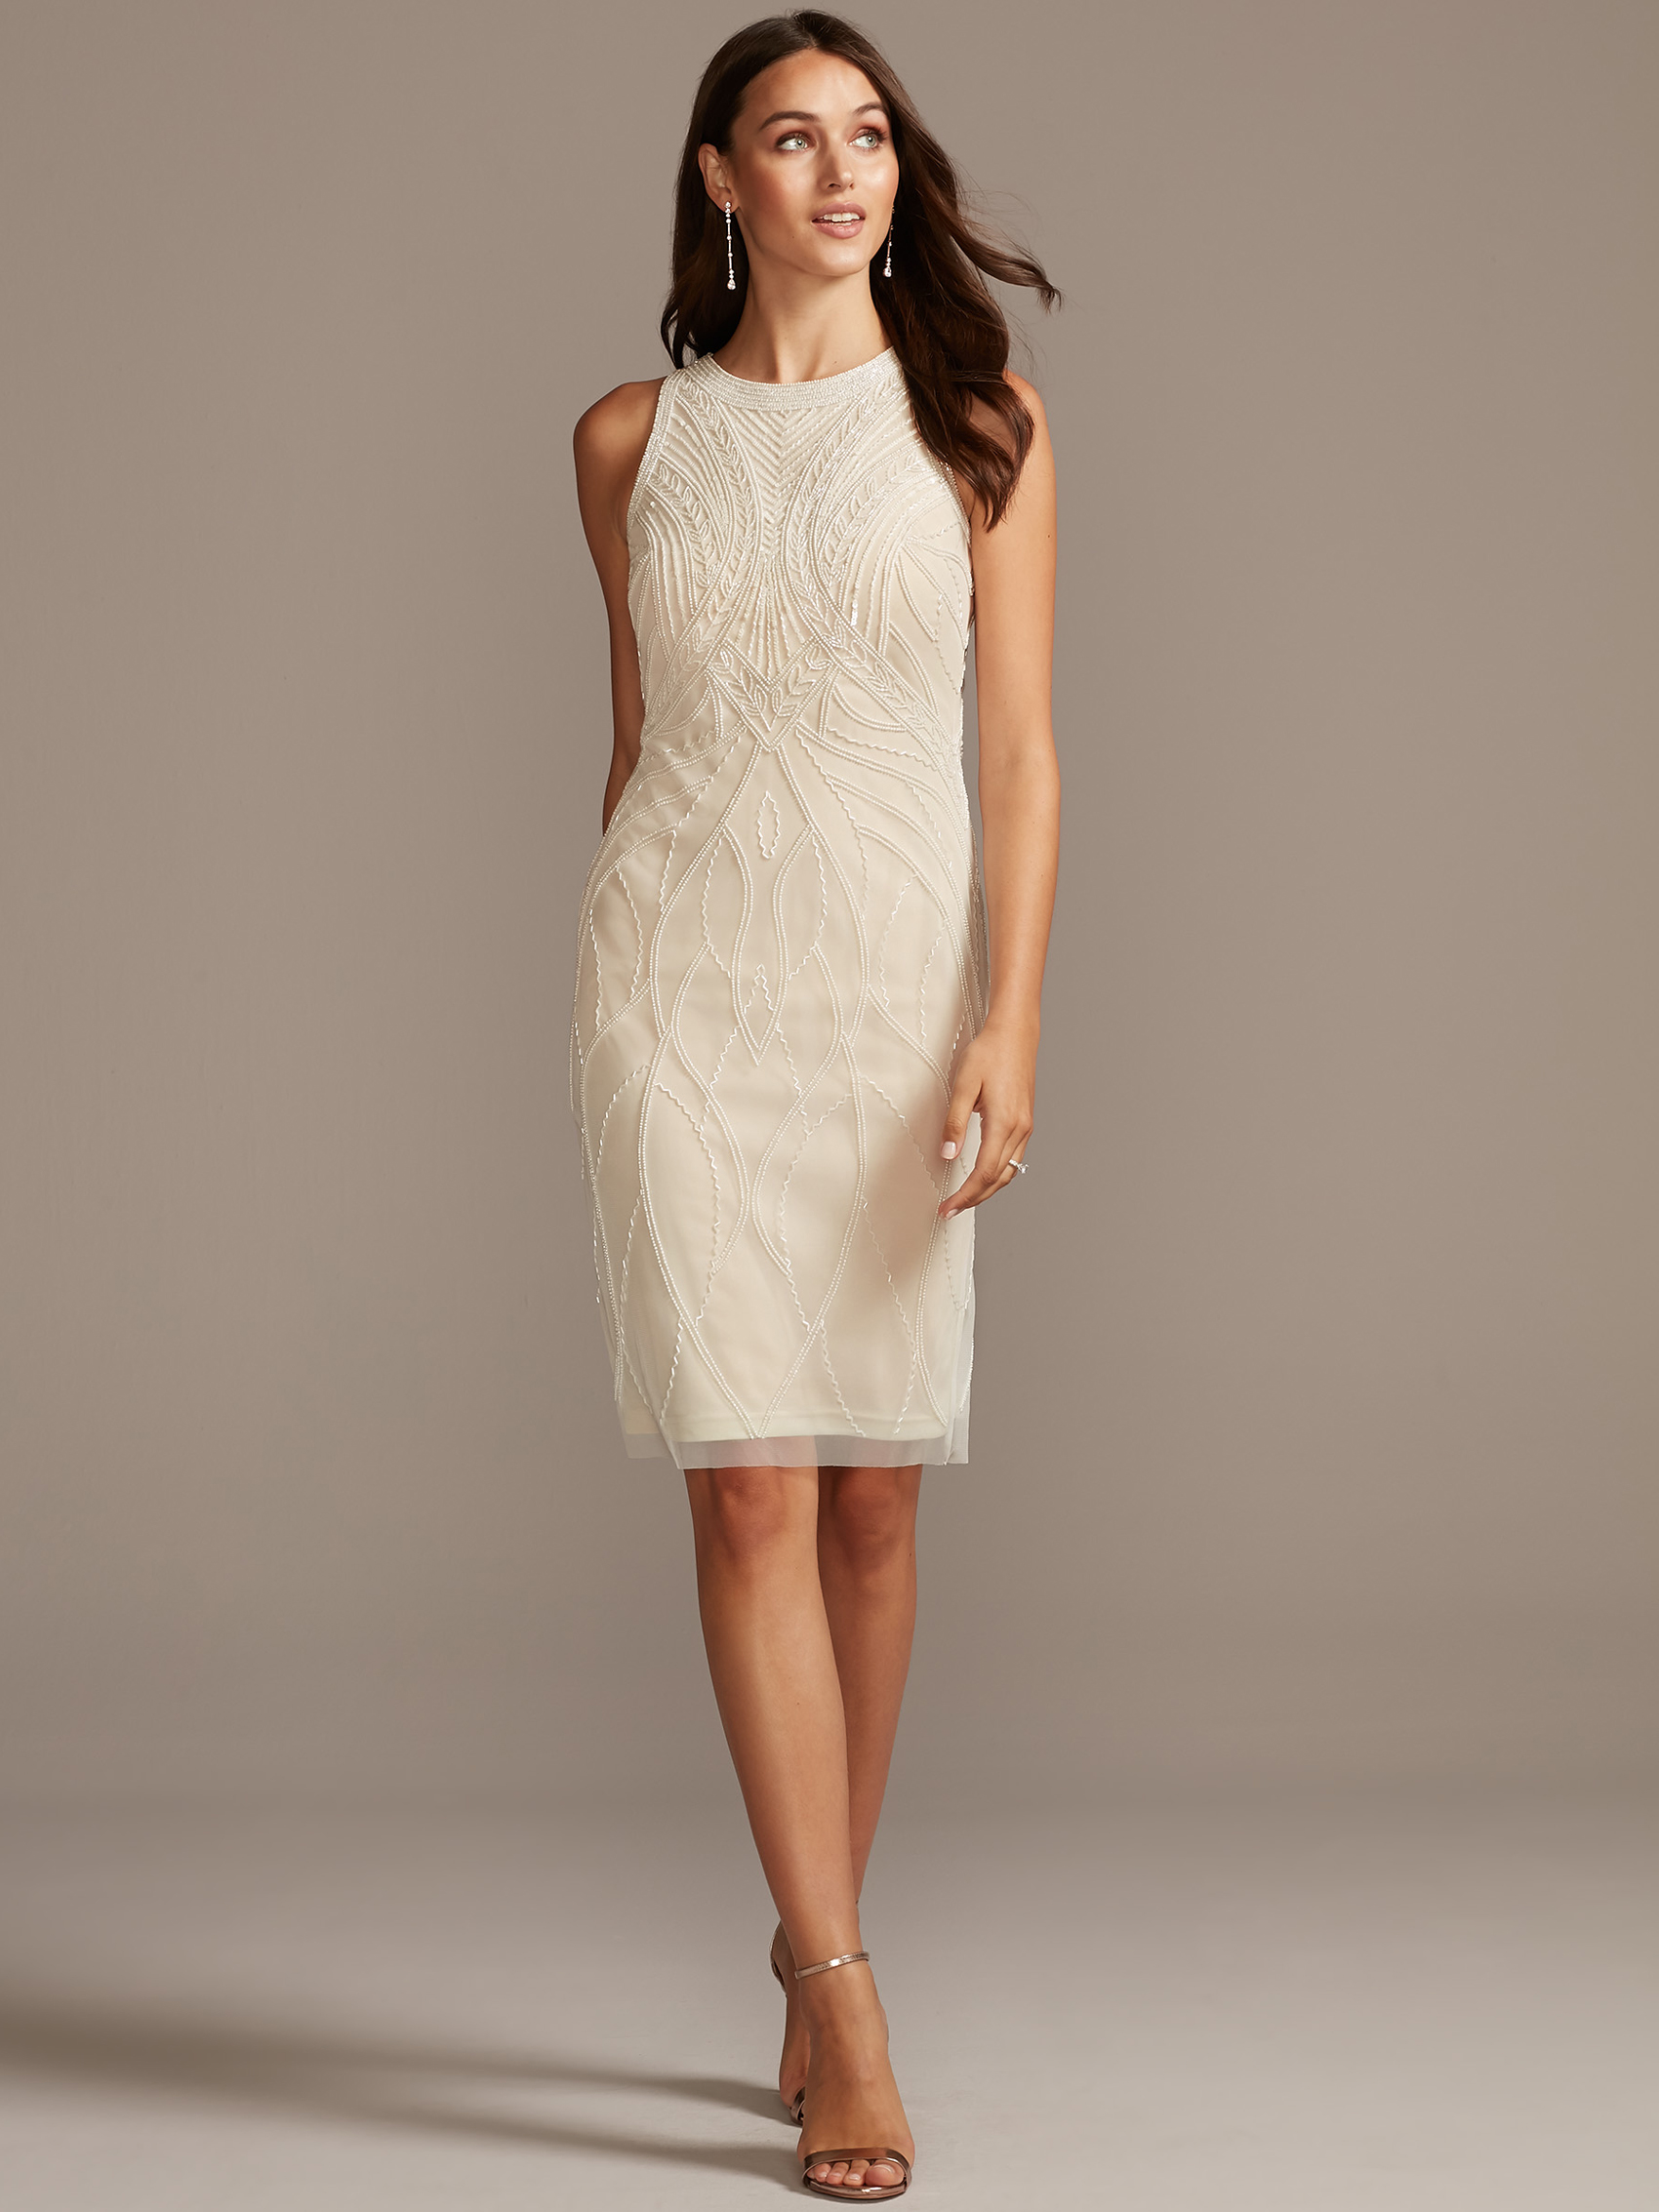 davids bridal db studio knee length high neck wedding dress fall 2020